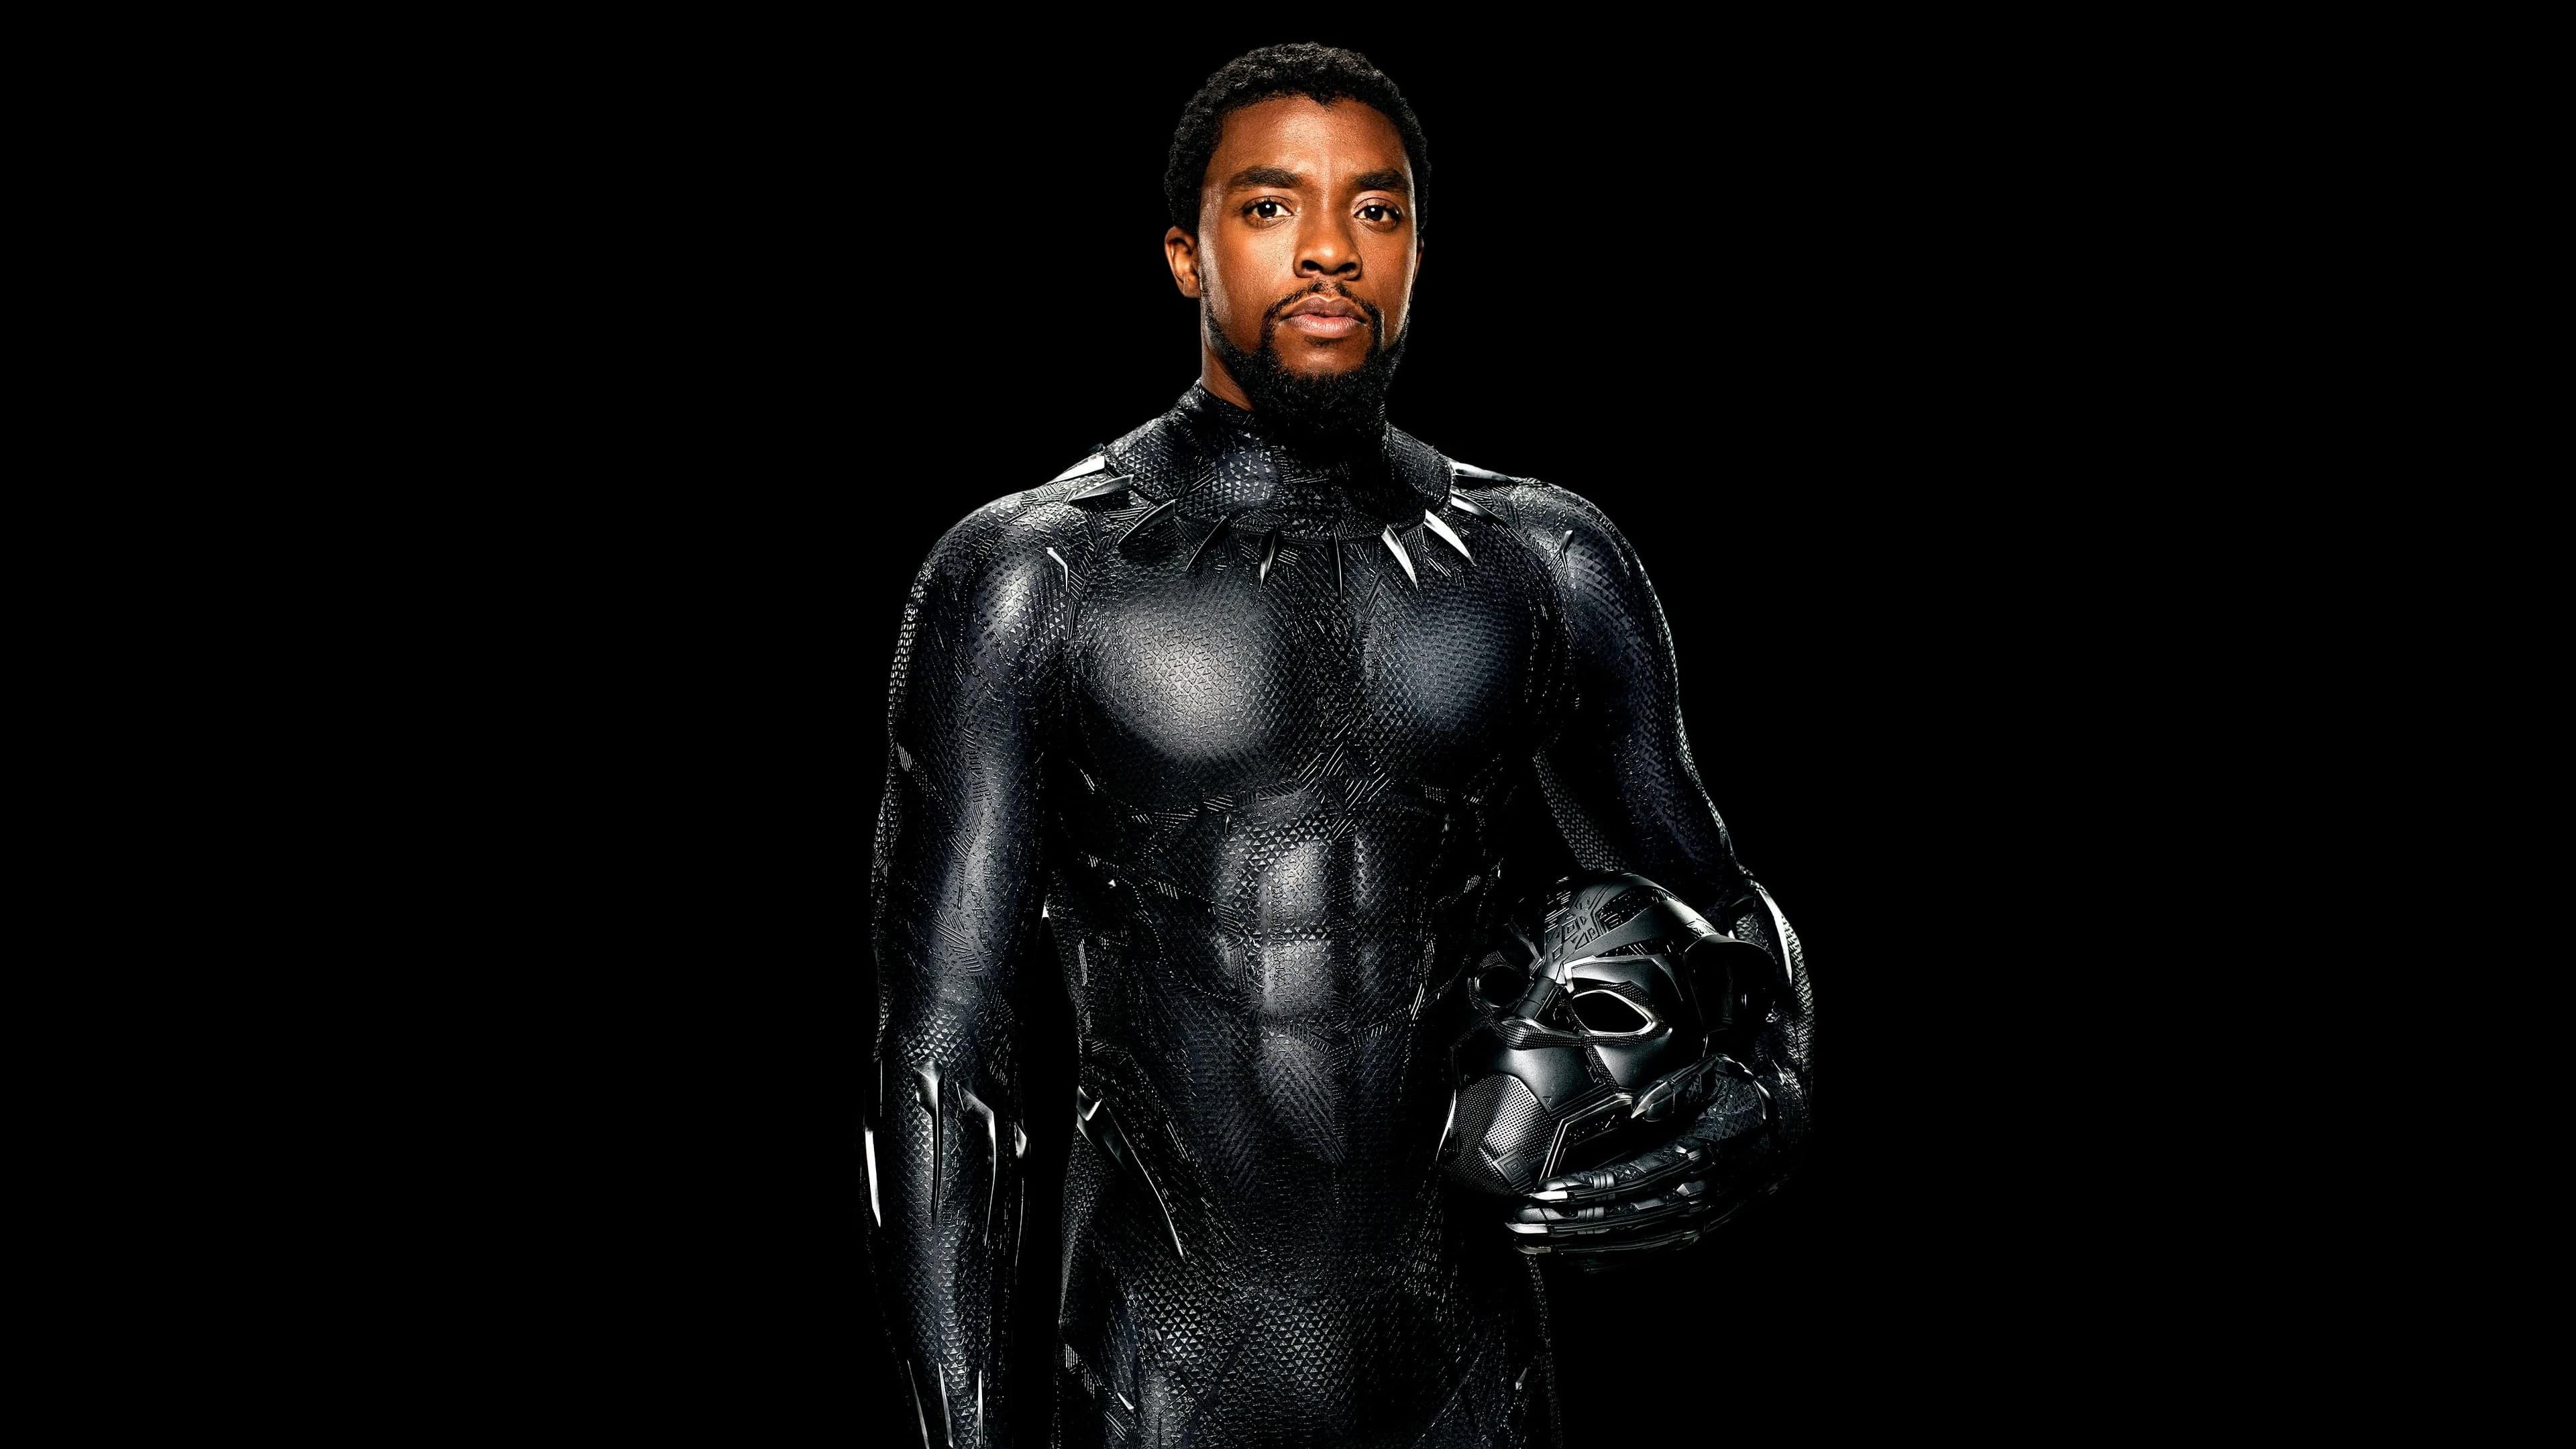 black panther chadwick boseman uhd 4k wallpaper